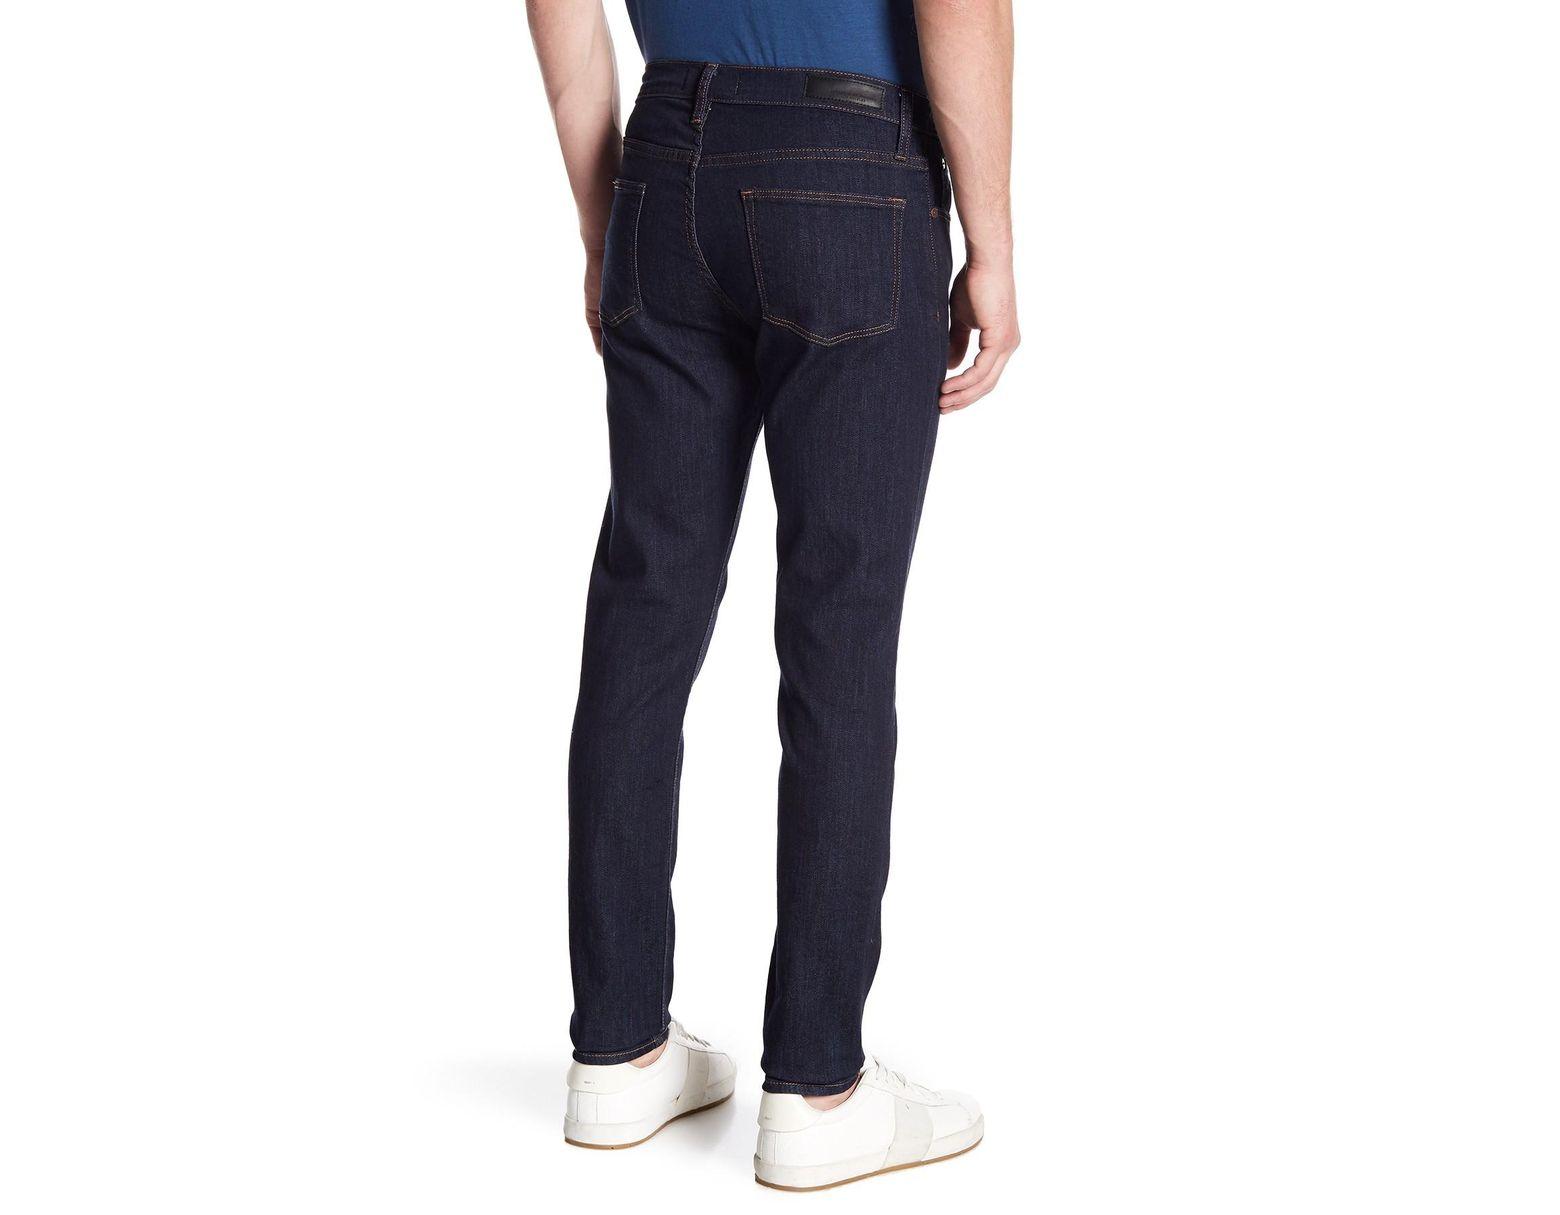 2b54056145 Articles of Society Dylan Dark Denim Slim Jeans in Blue for Men - Lyst